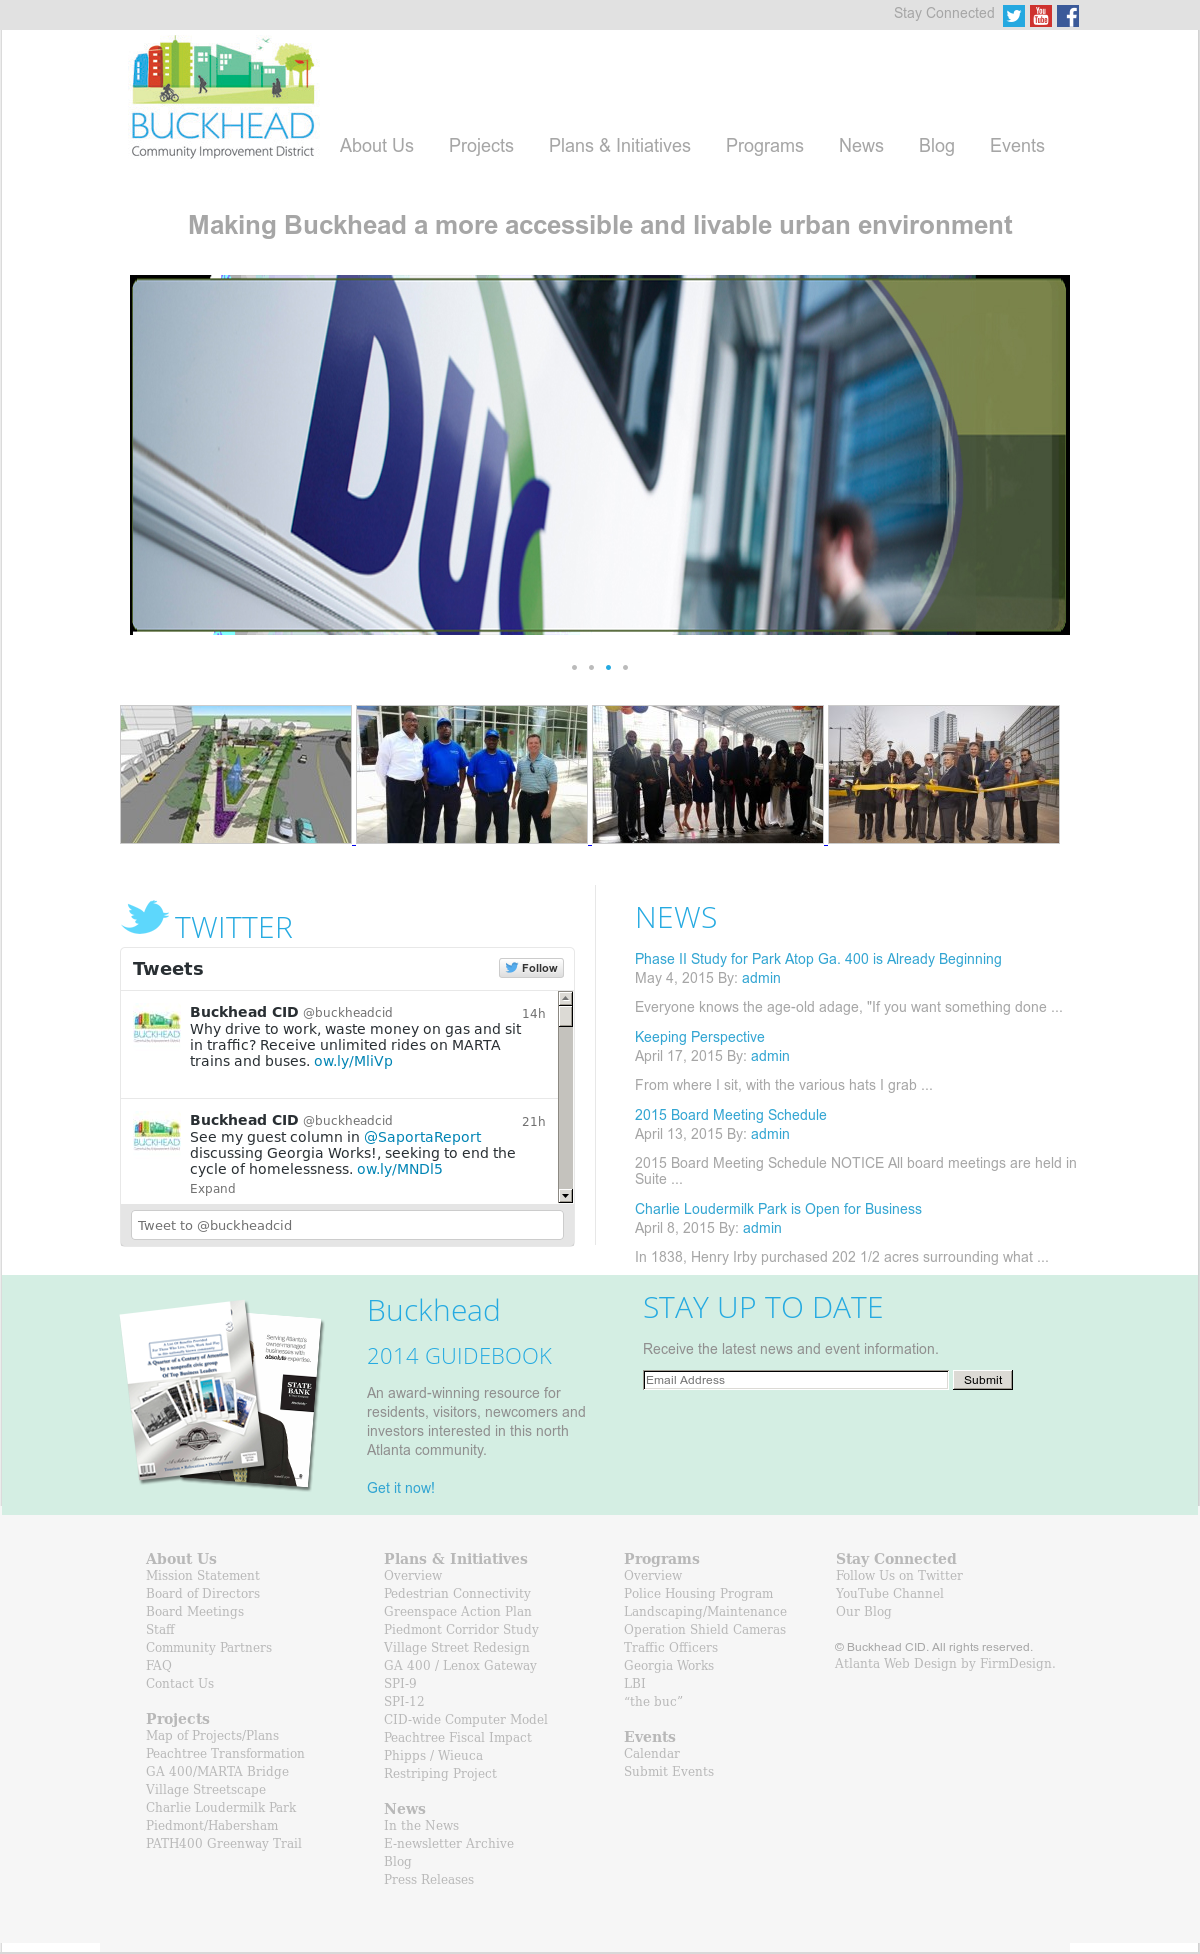 Buckhead Cid Competitors, Revenue and Employees - Owler Company Profile